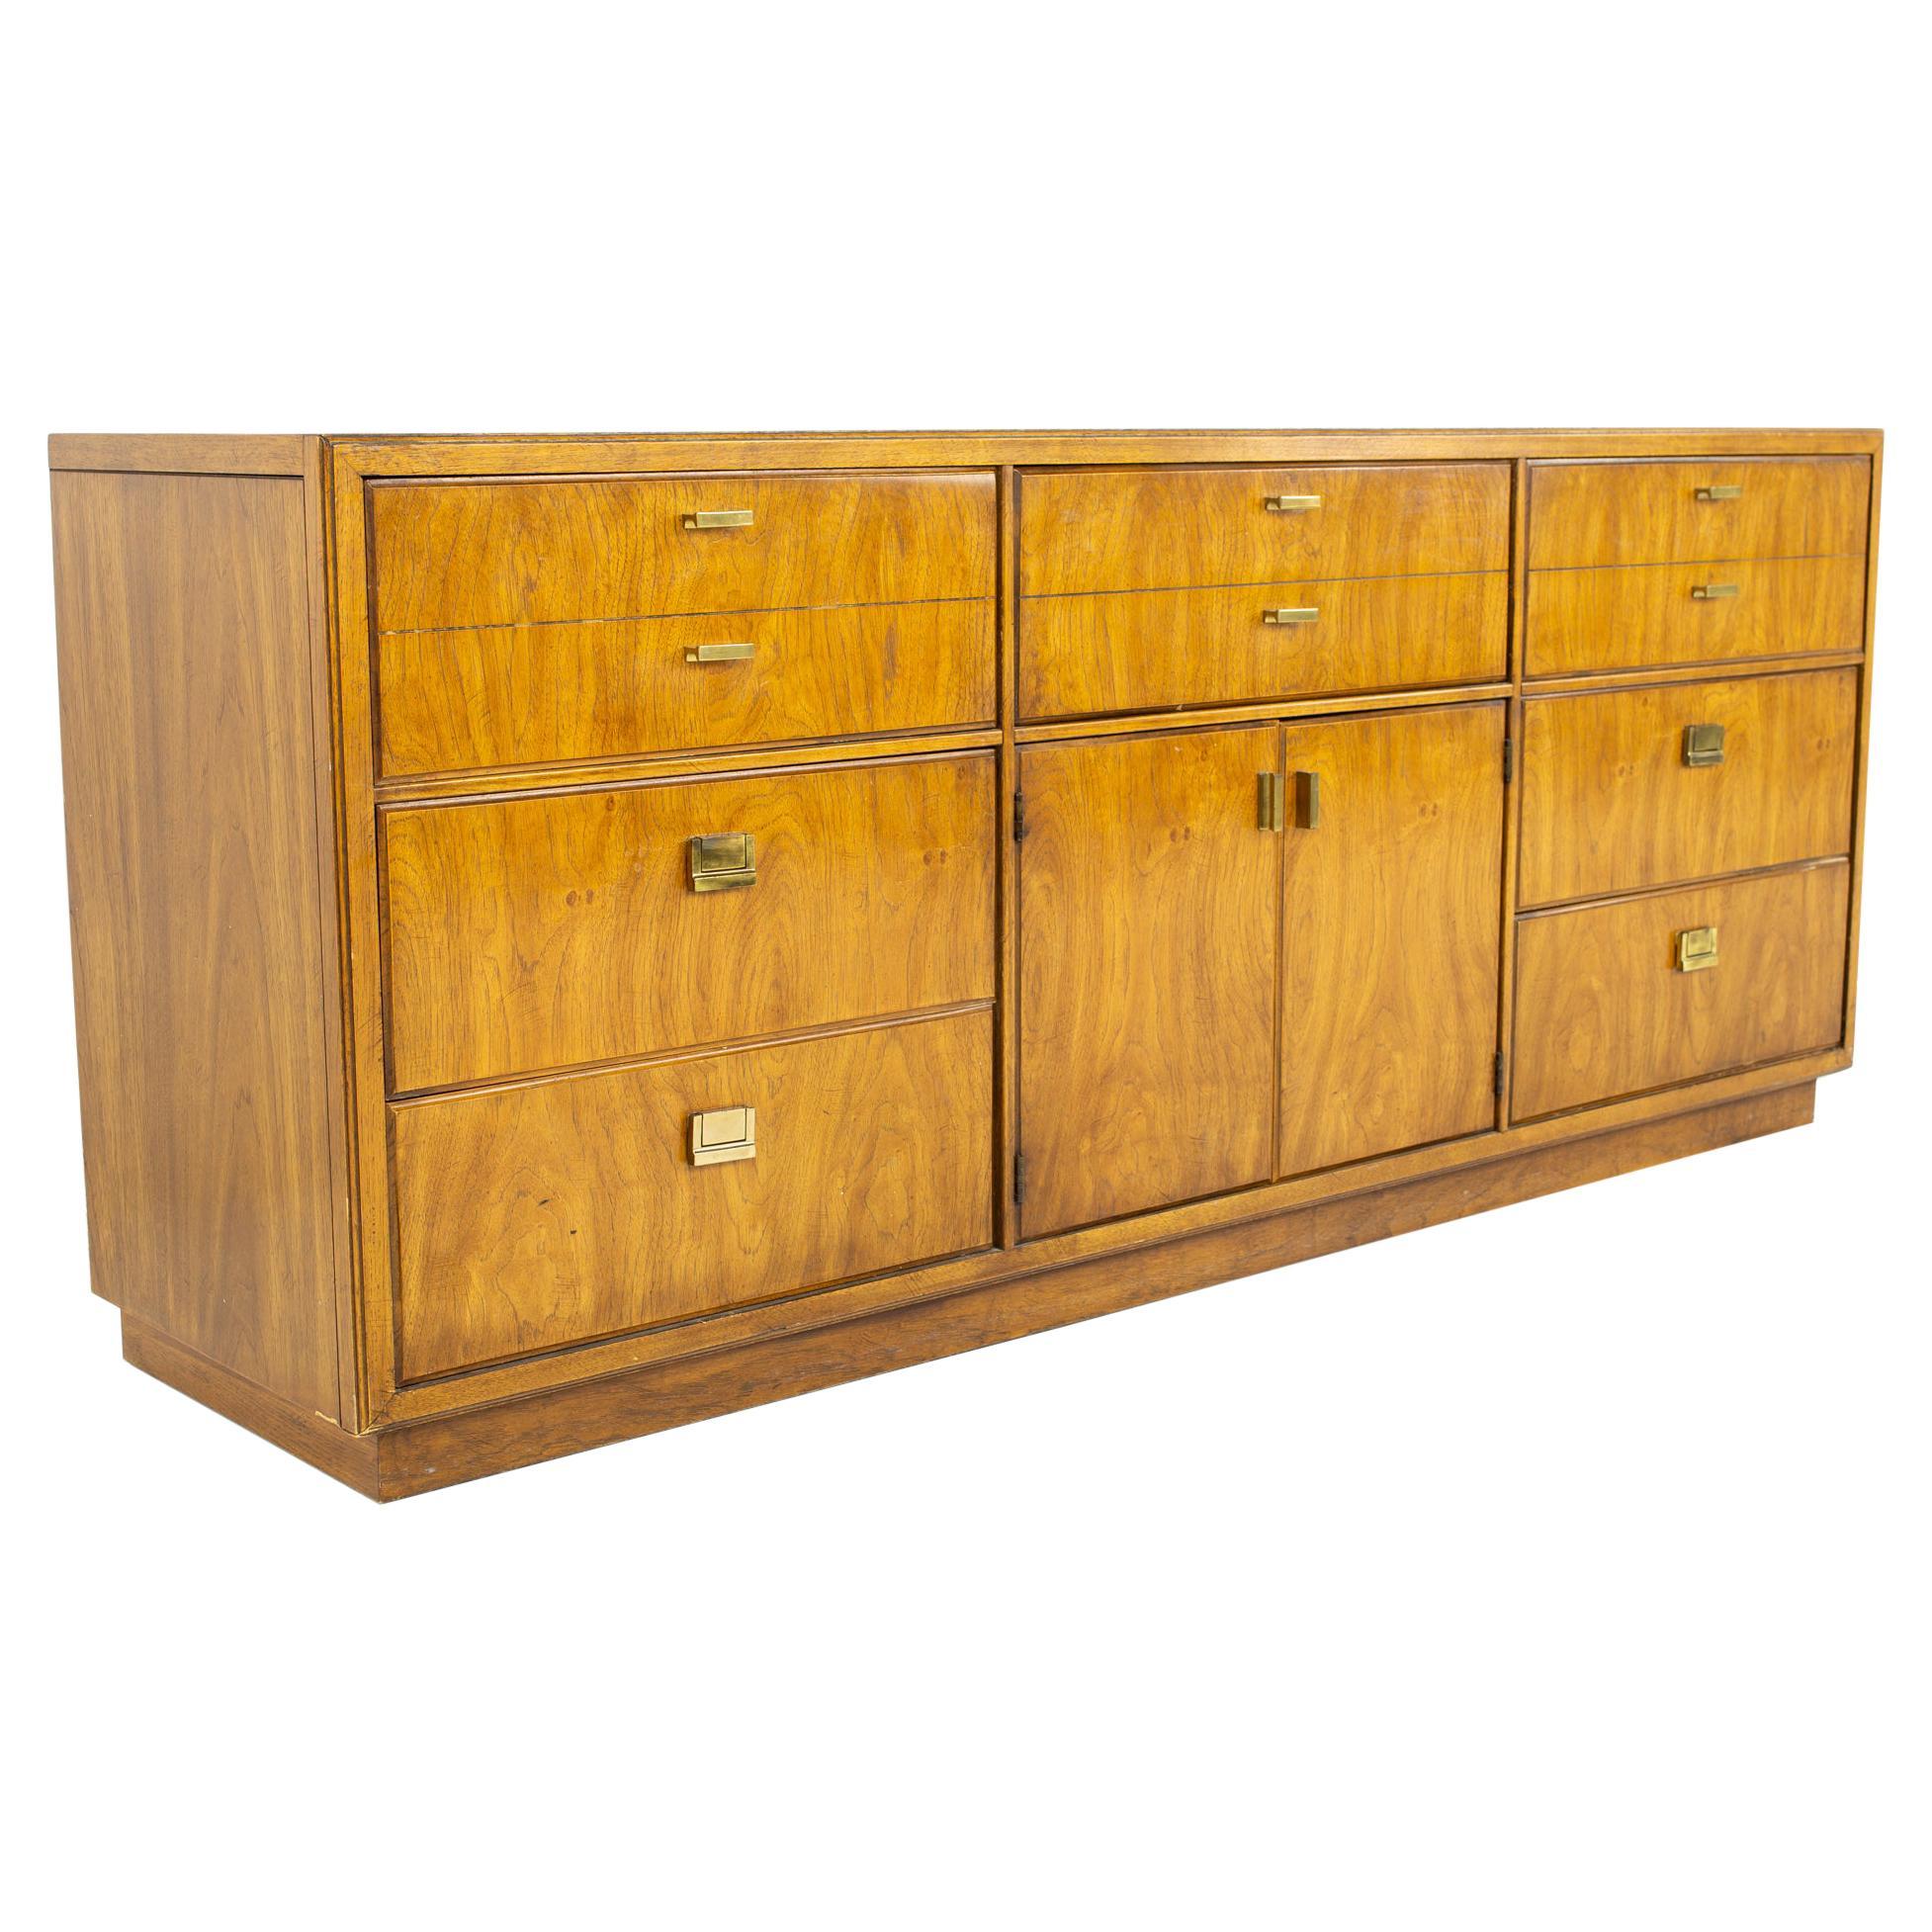 Drexel Heritage Consensus Mid Century Pecan and Brass 9 Drawer Lowboy Dresser